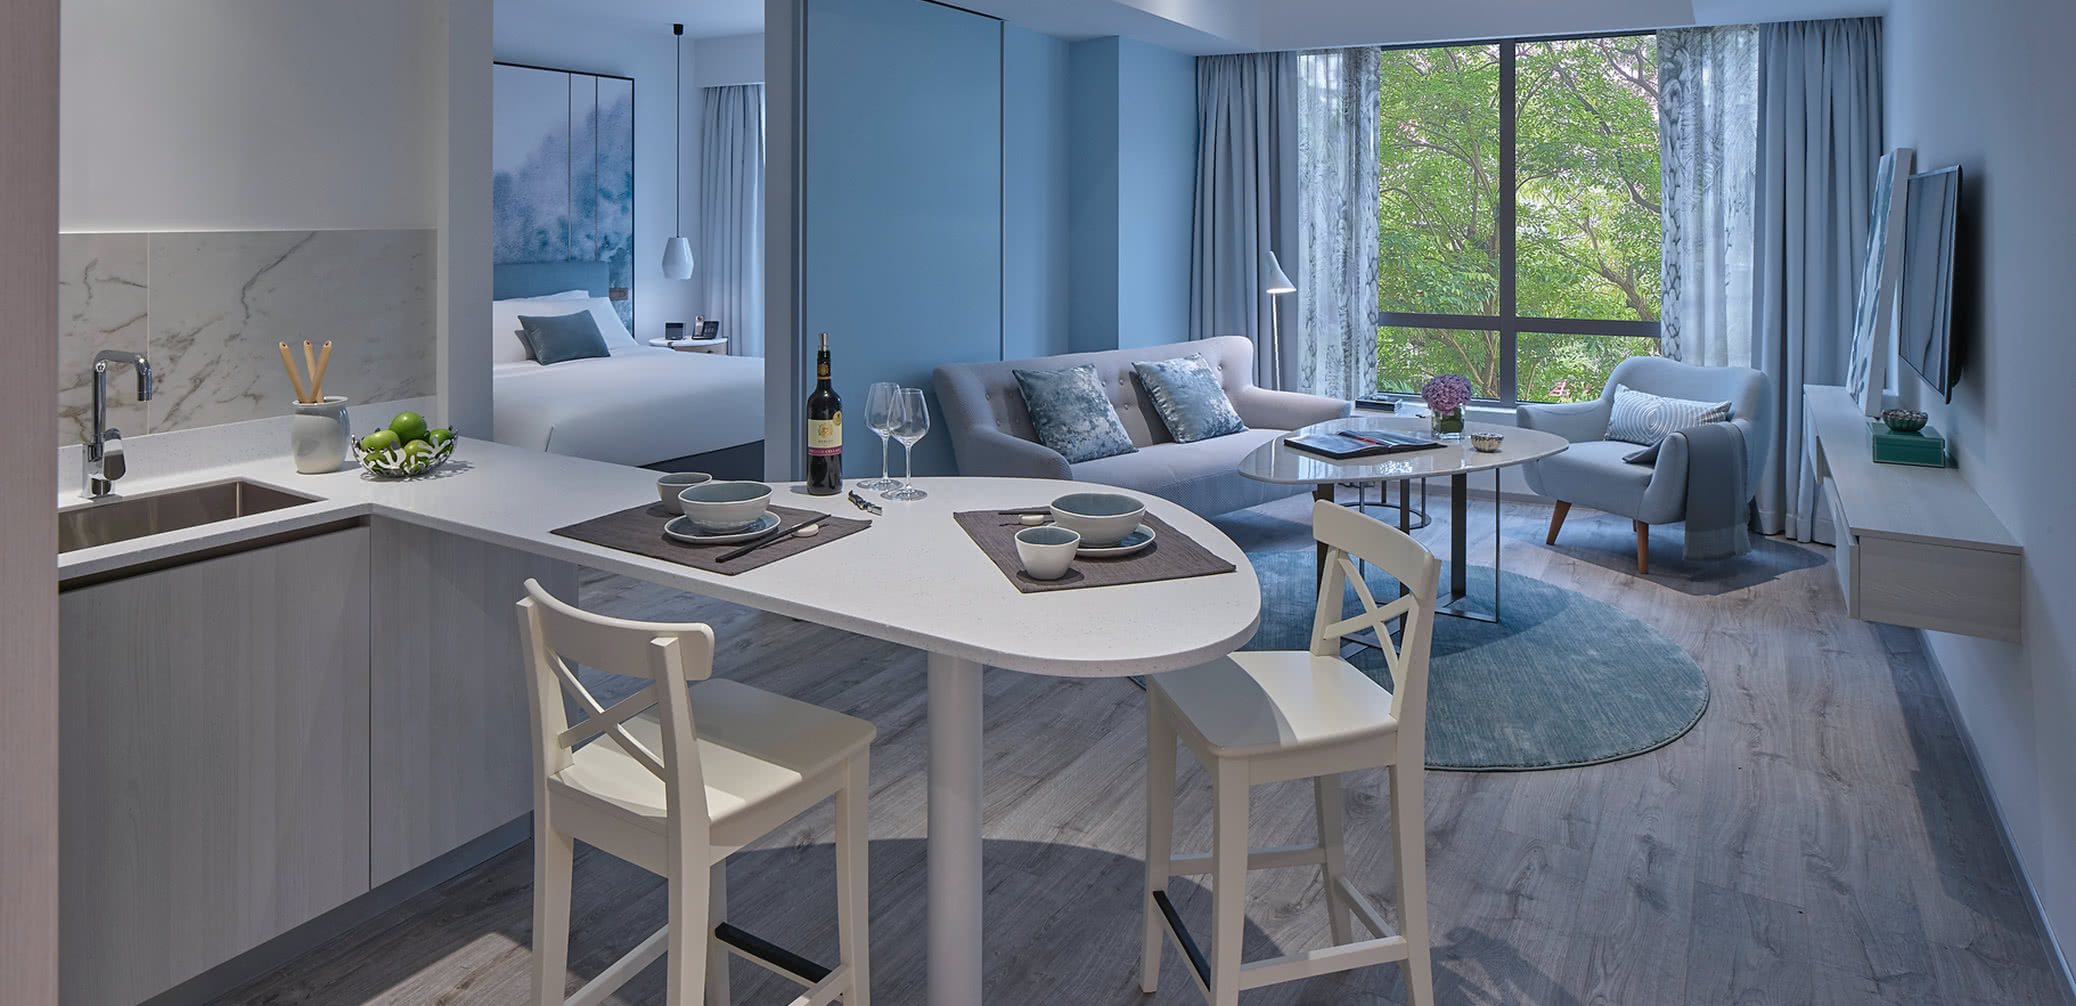 service apartments singapore